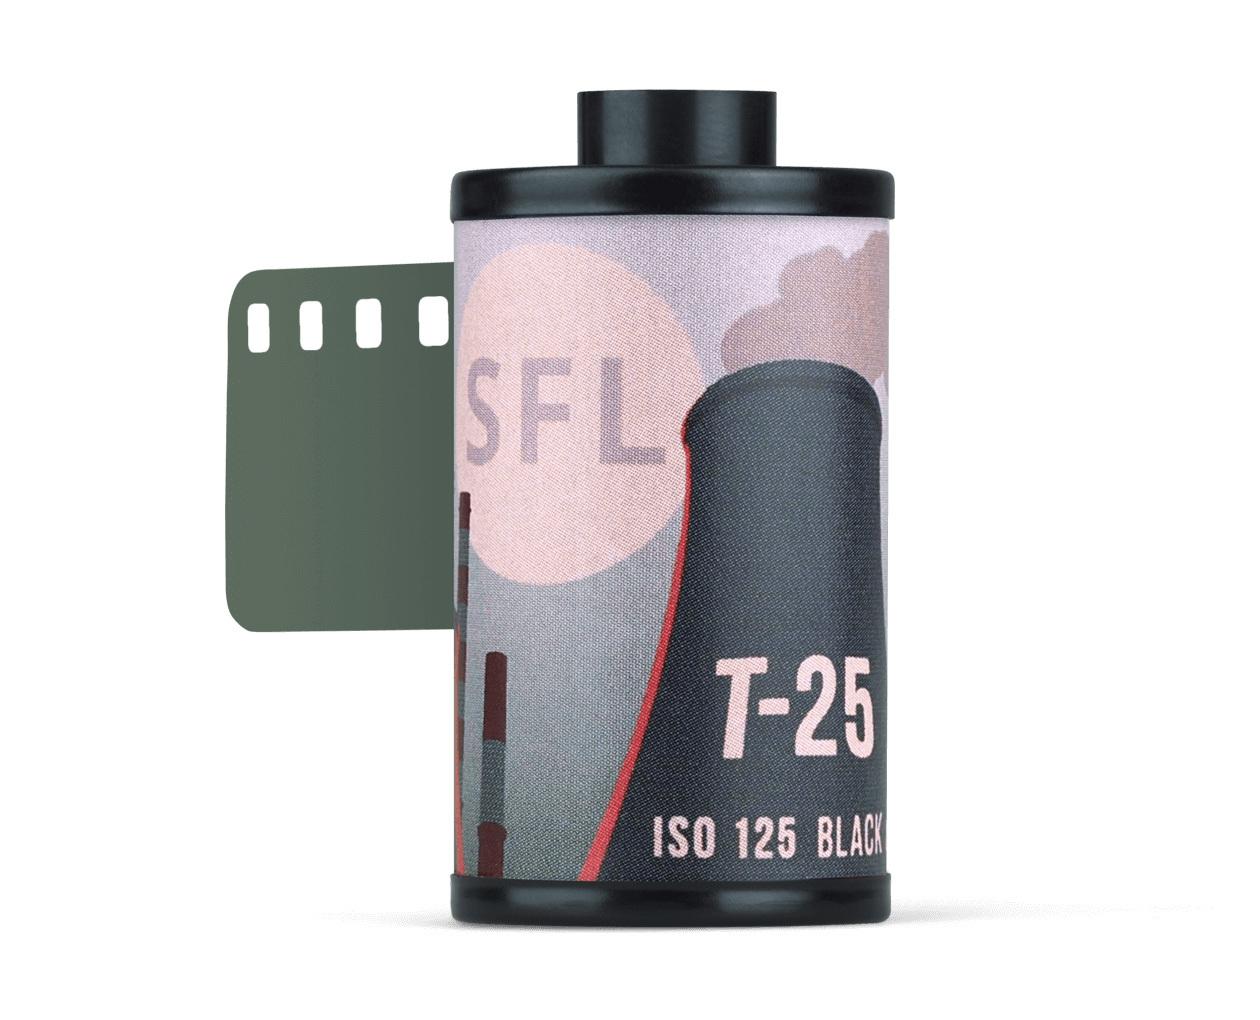 фотопленка sfl тасма t-25 (135/36) ч/б негативная в кассете